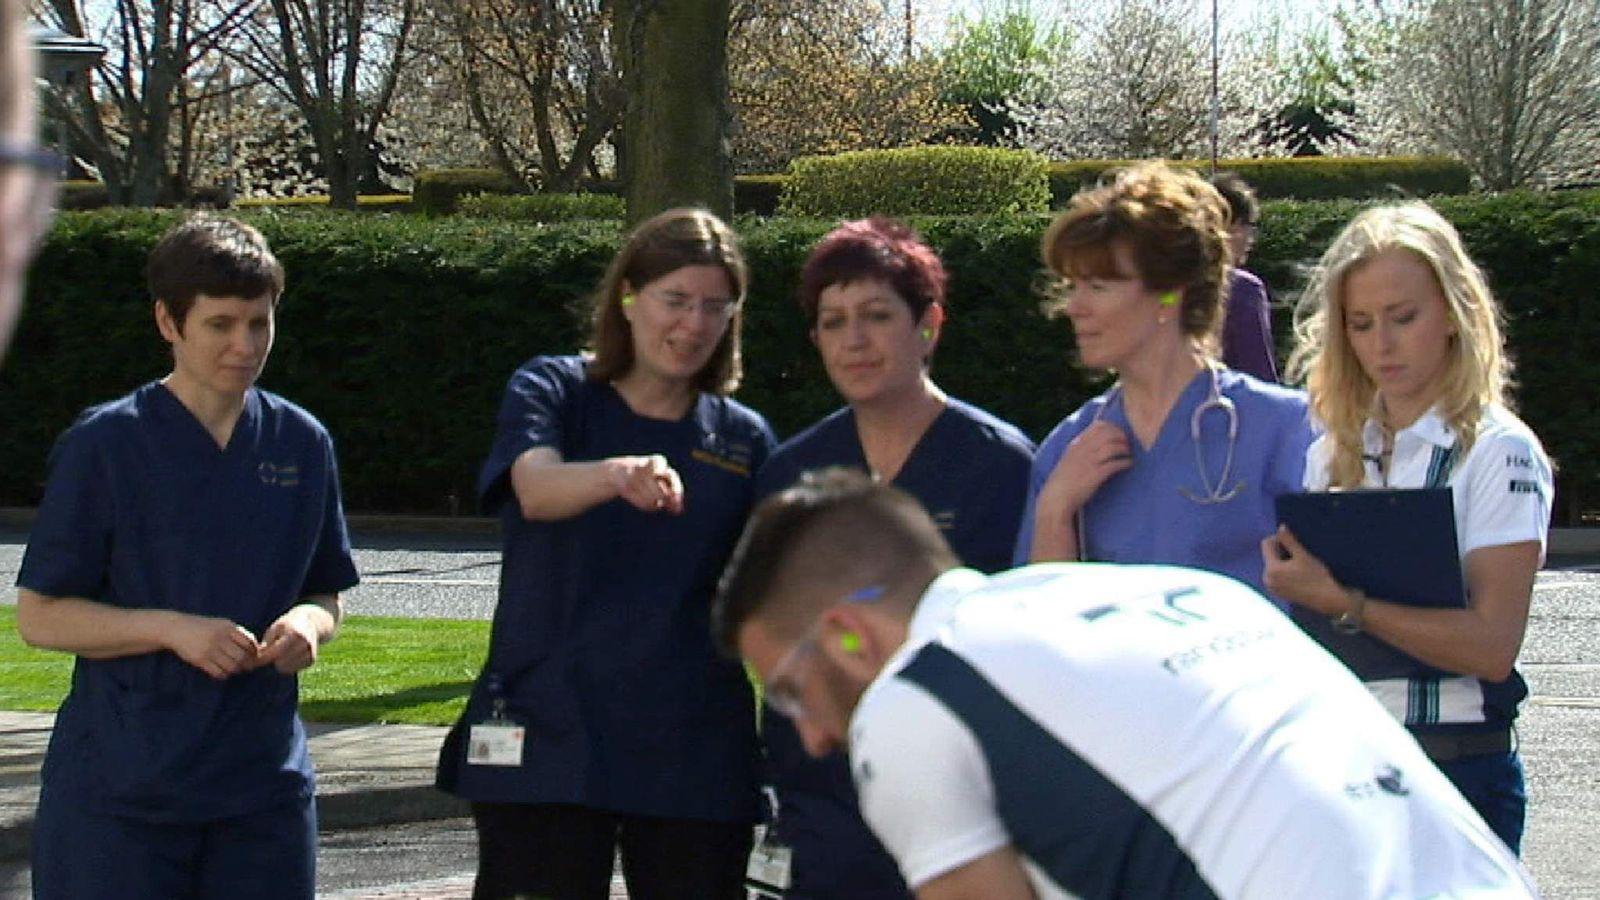 F1 Hospital staff